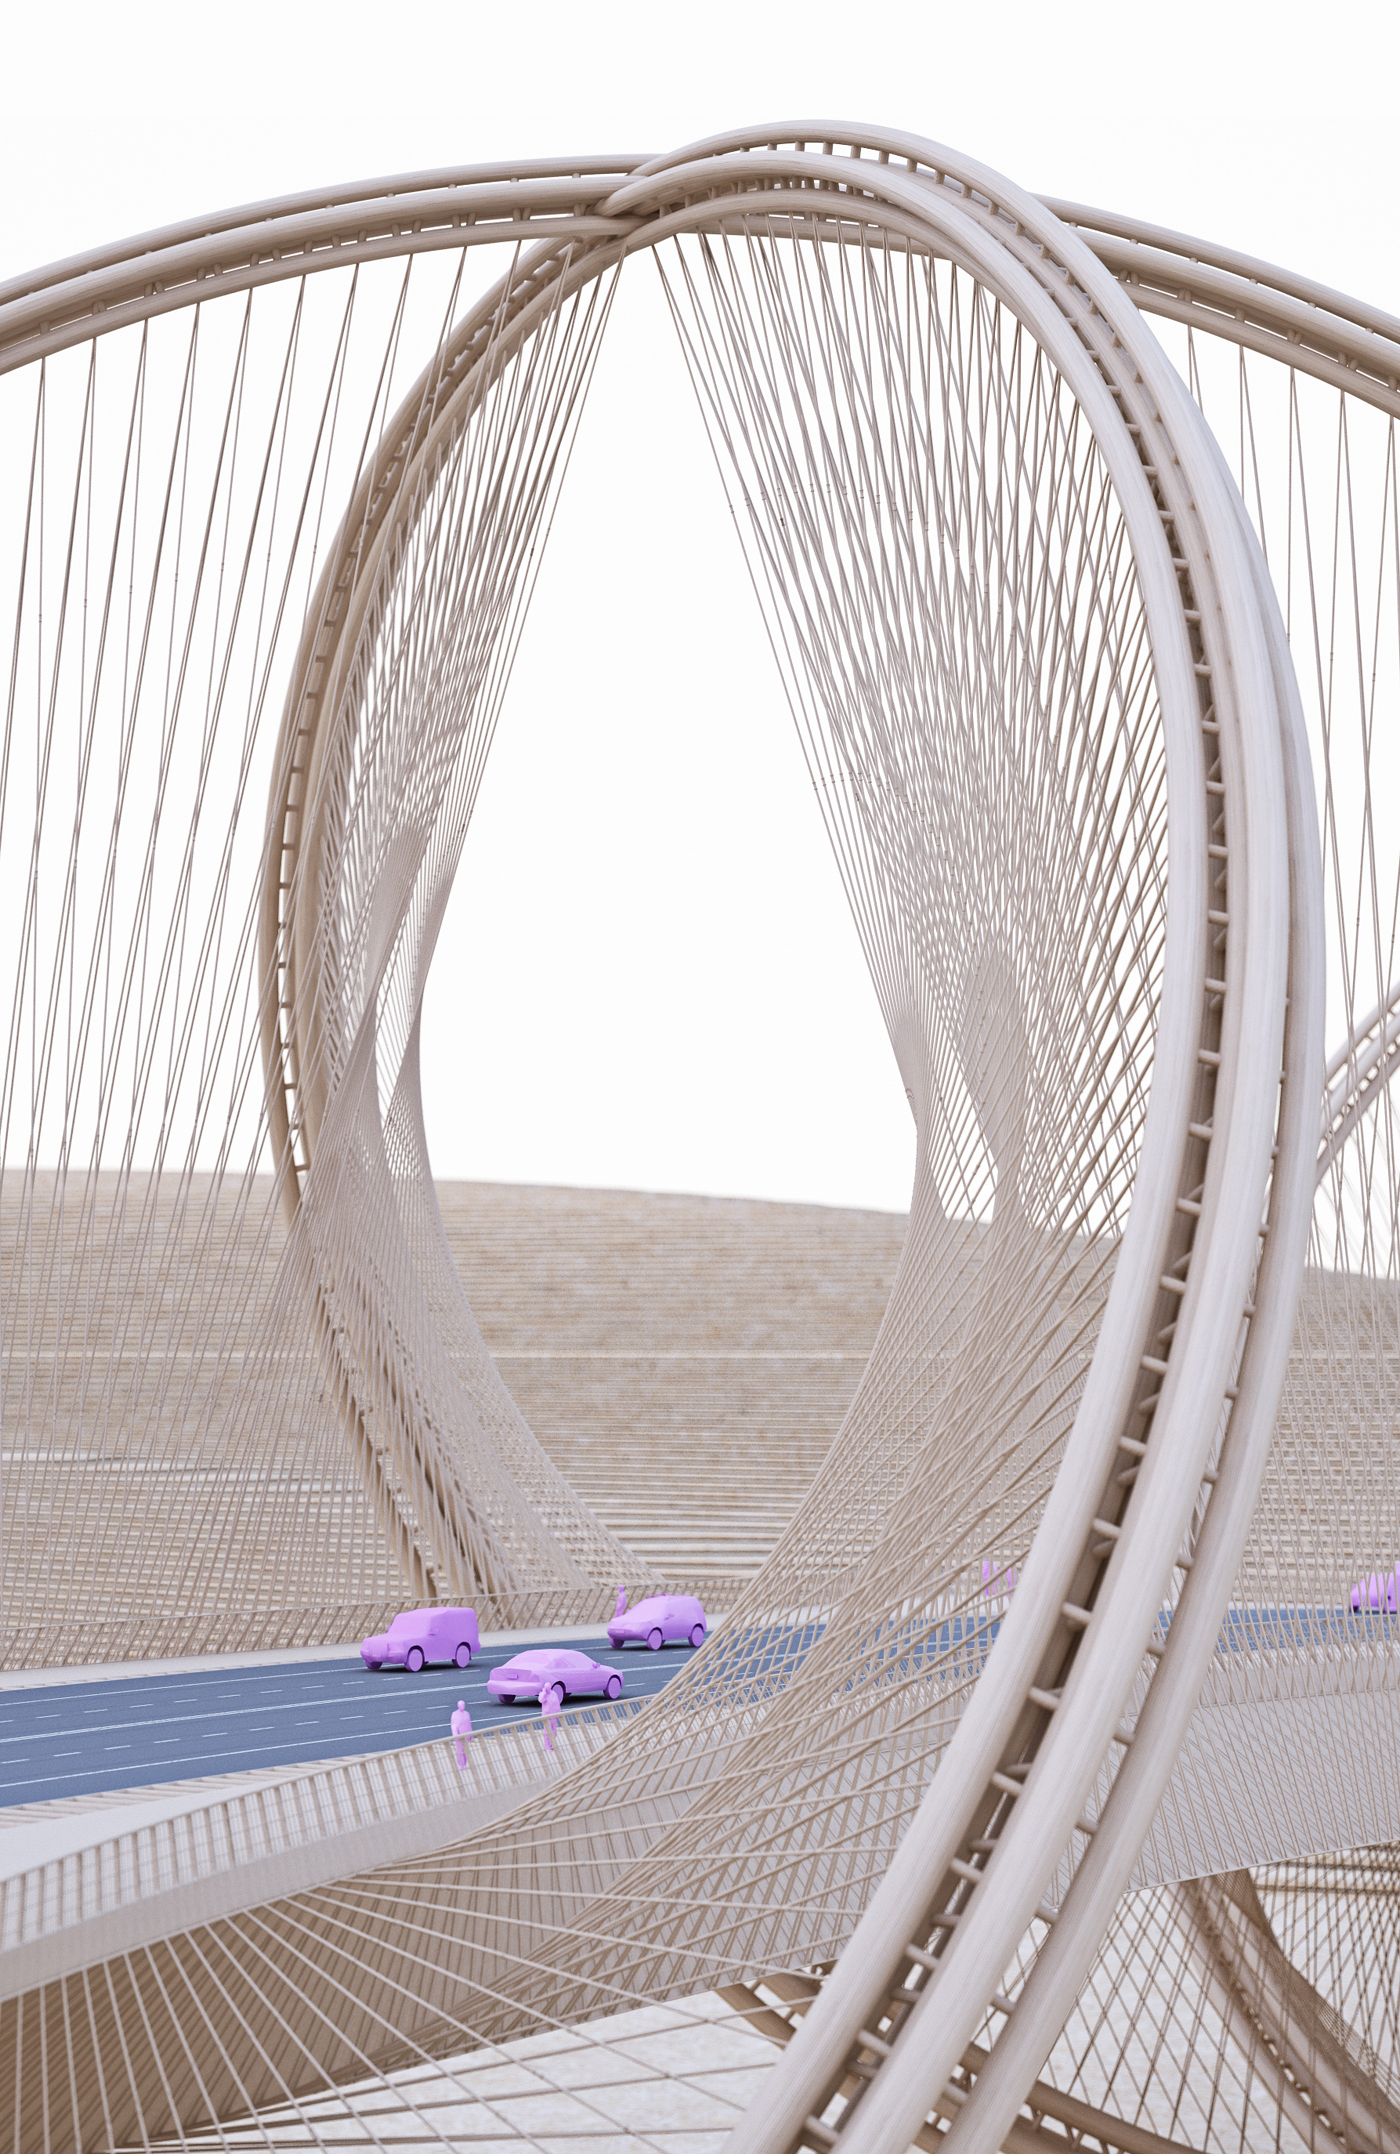 Bridge inspired by olympics rings for 2022 beijing winter games 21